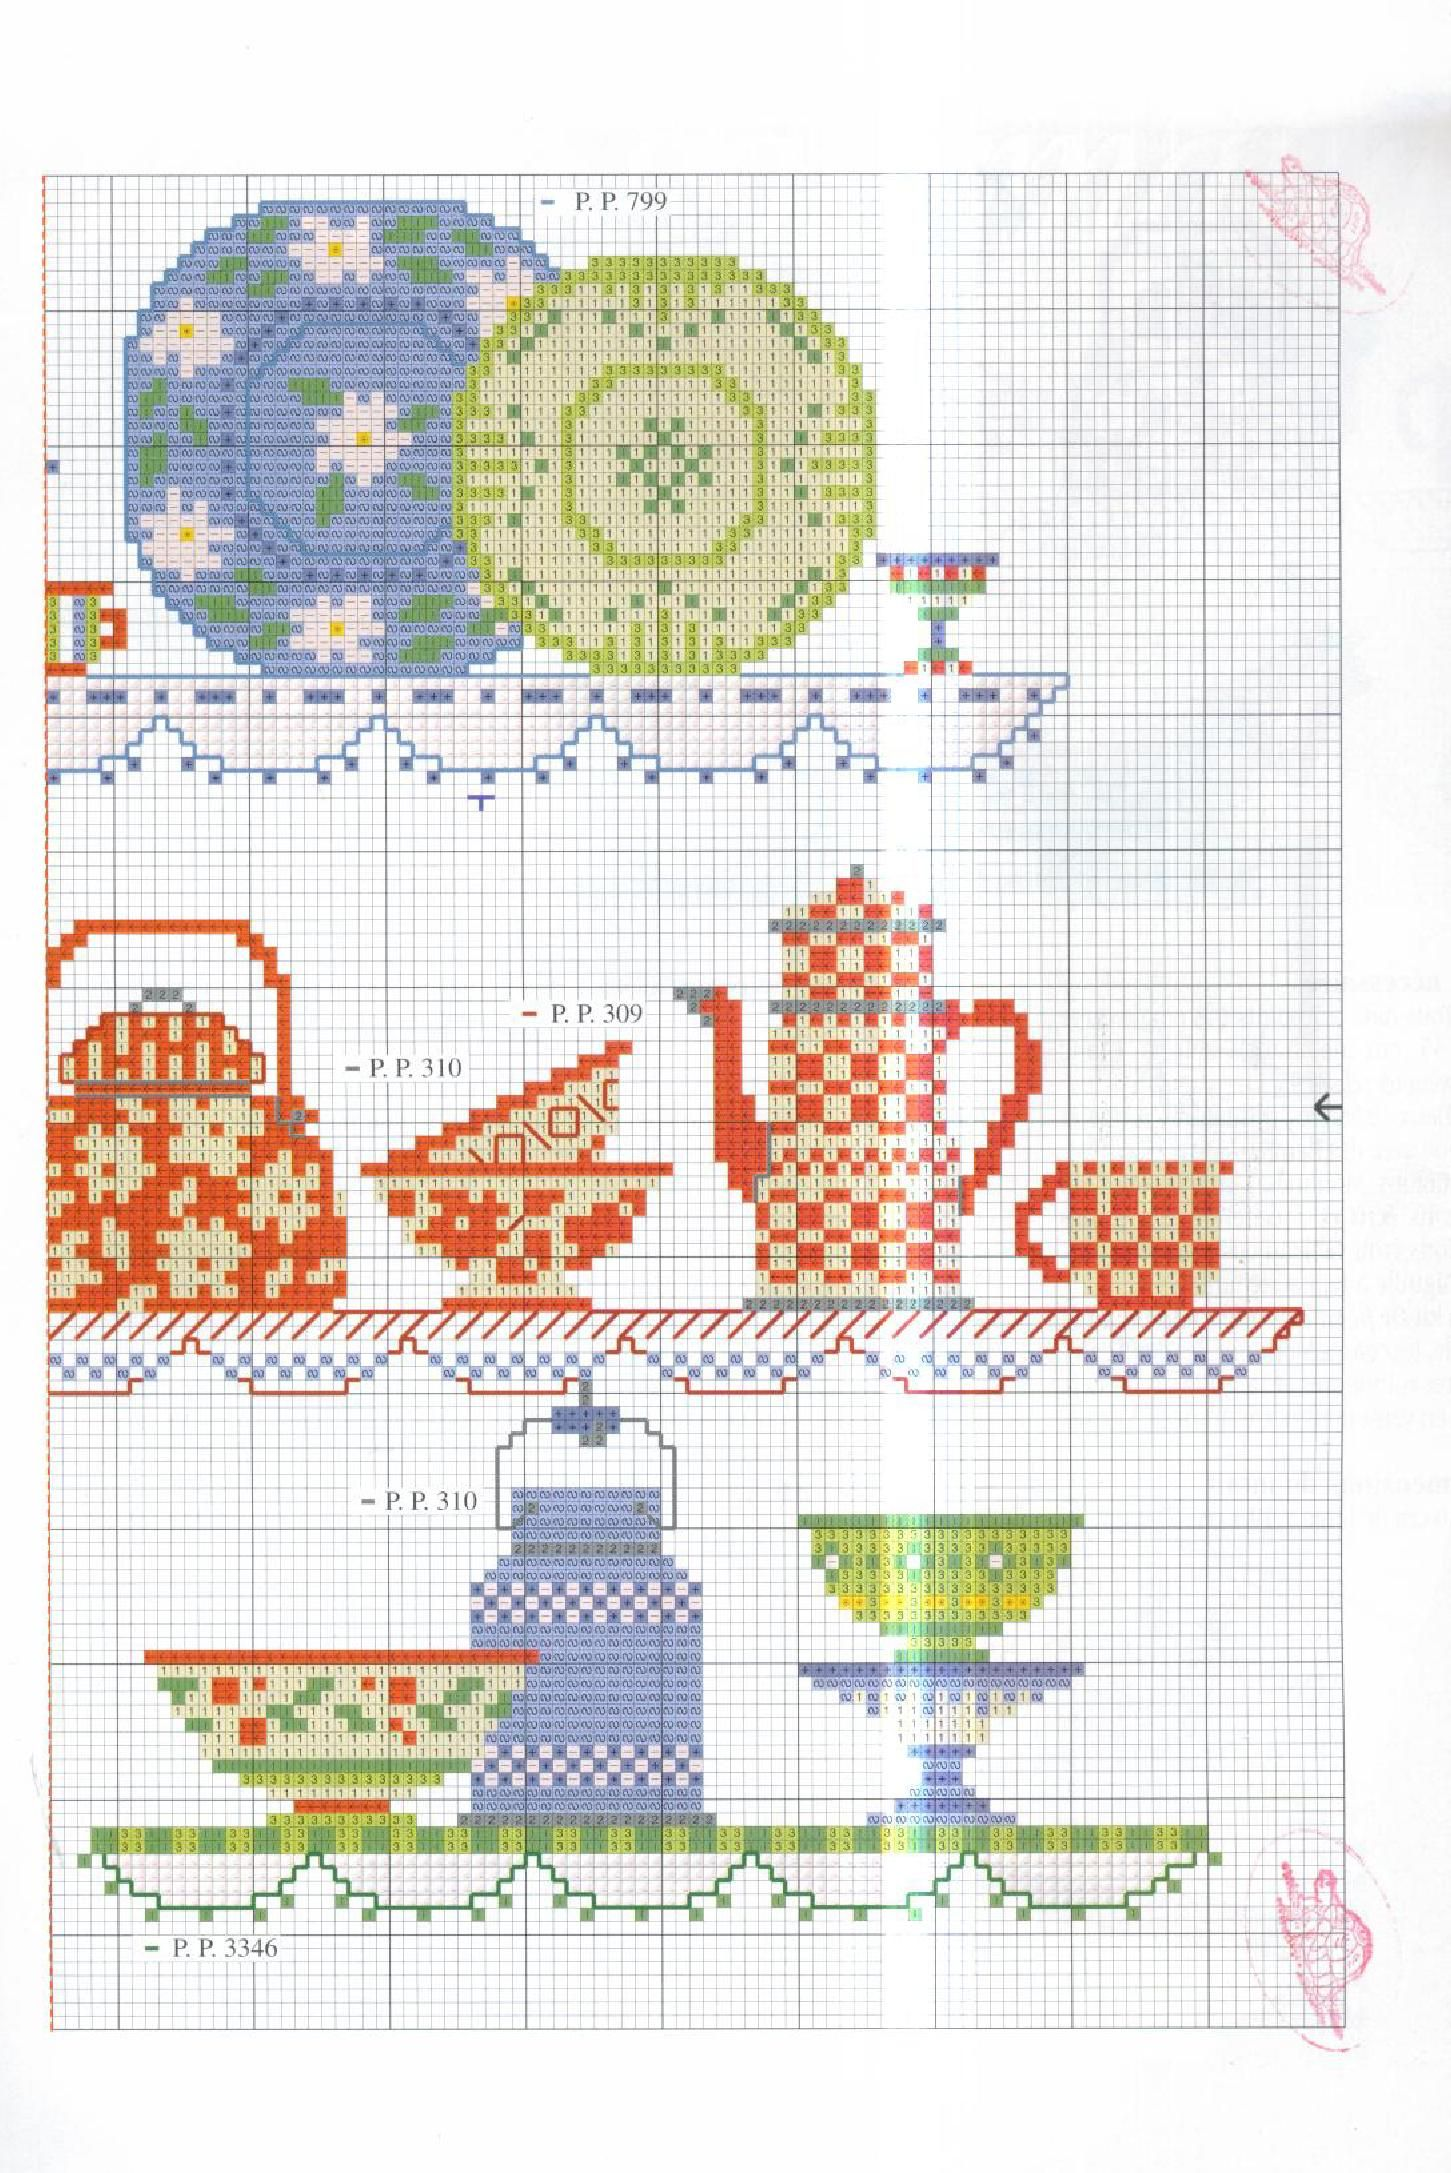 Pin de Ana De Lara Macias en cenefas | Pinterest | Cross stitch ...